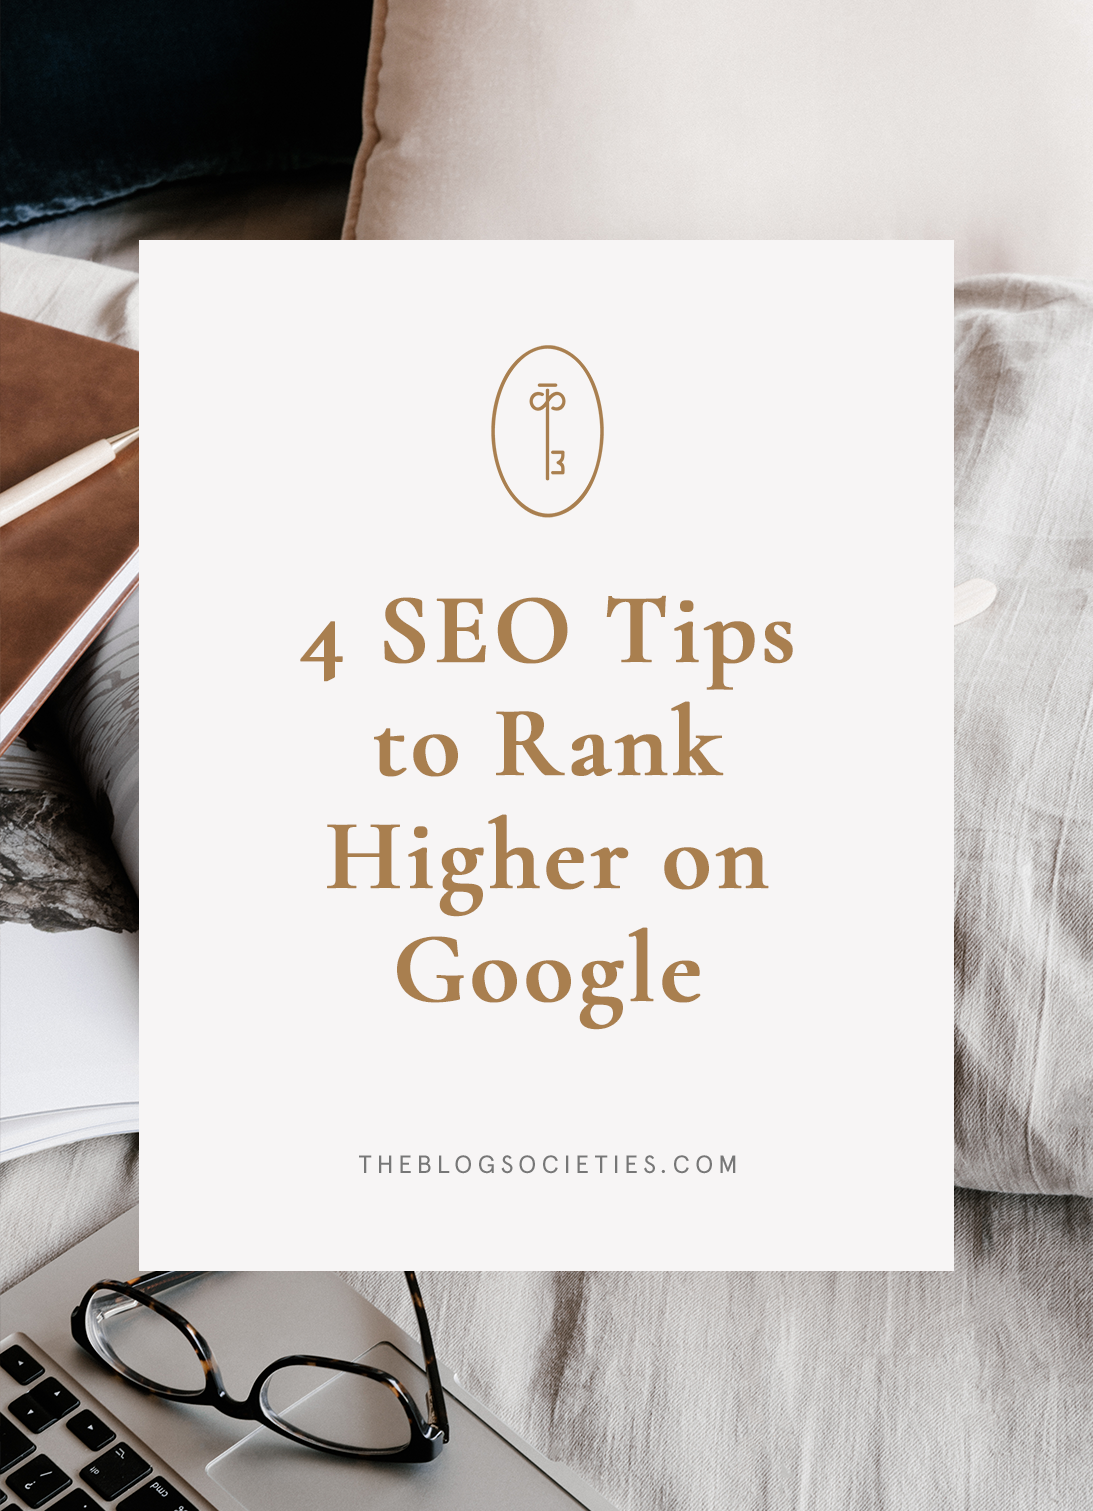 SEO Tips to Rank Higher on Google   The Blog Societies